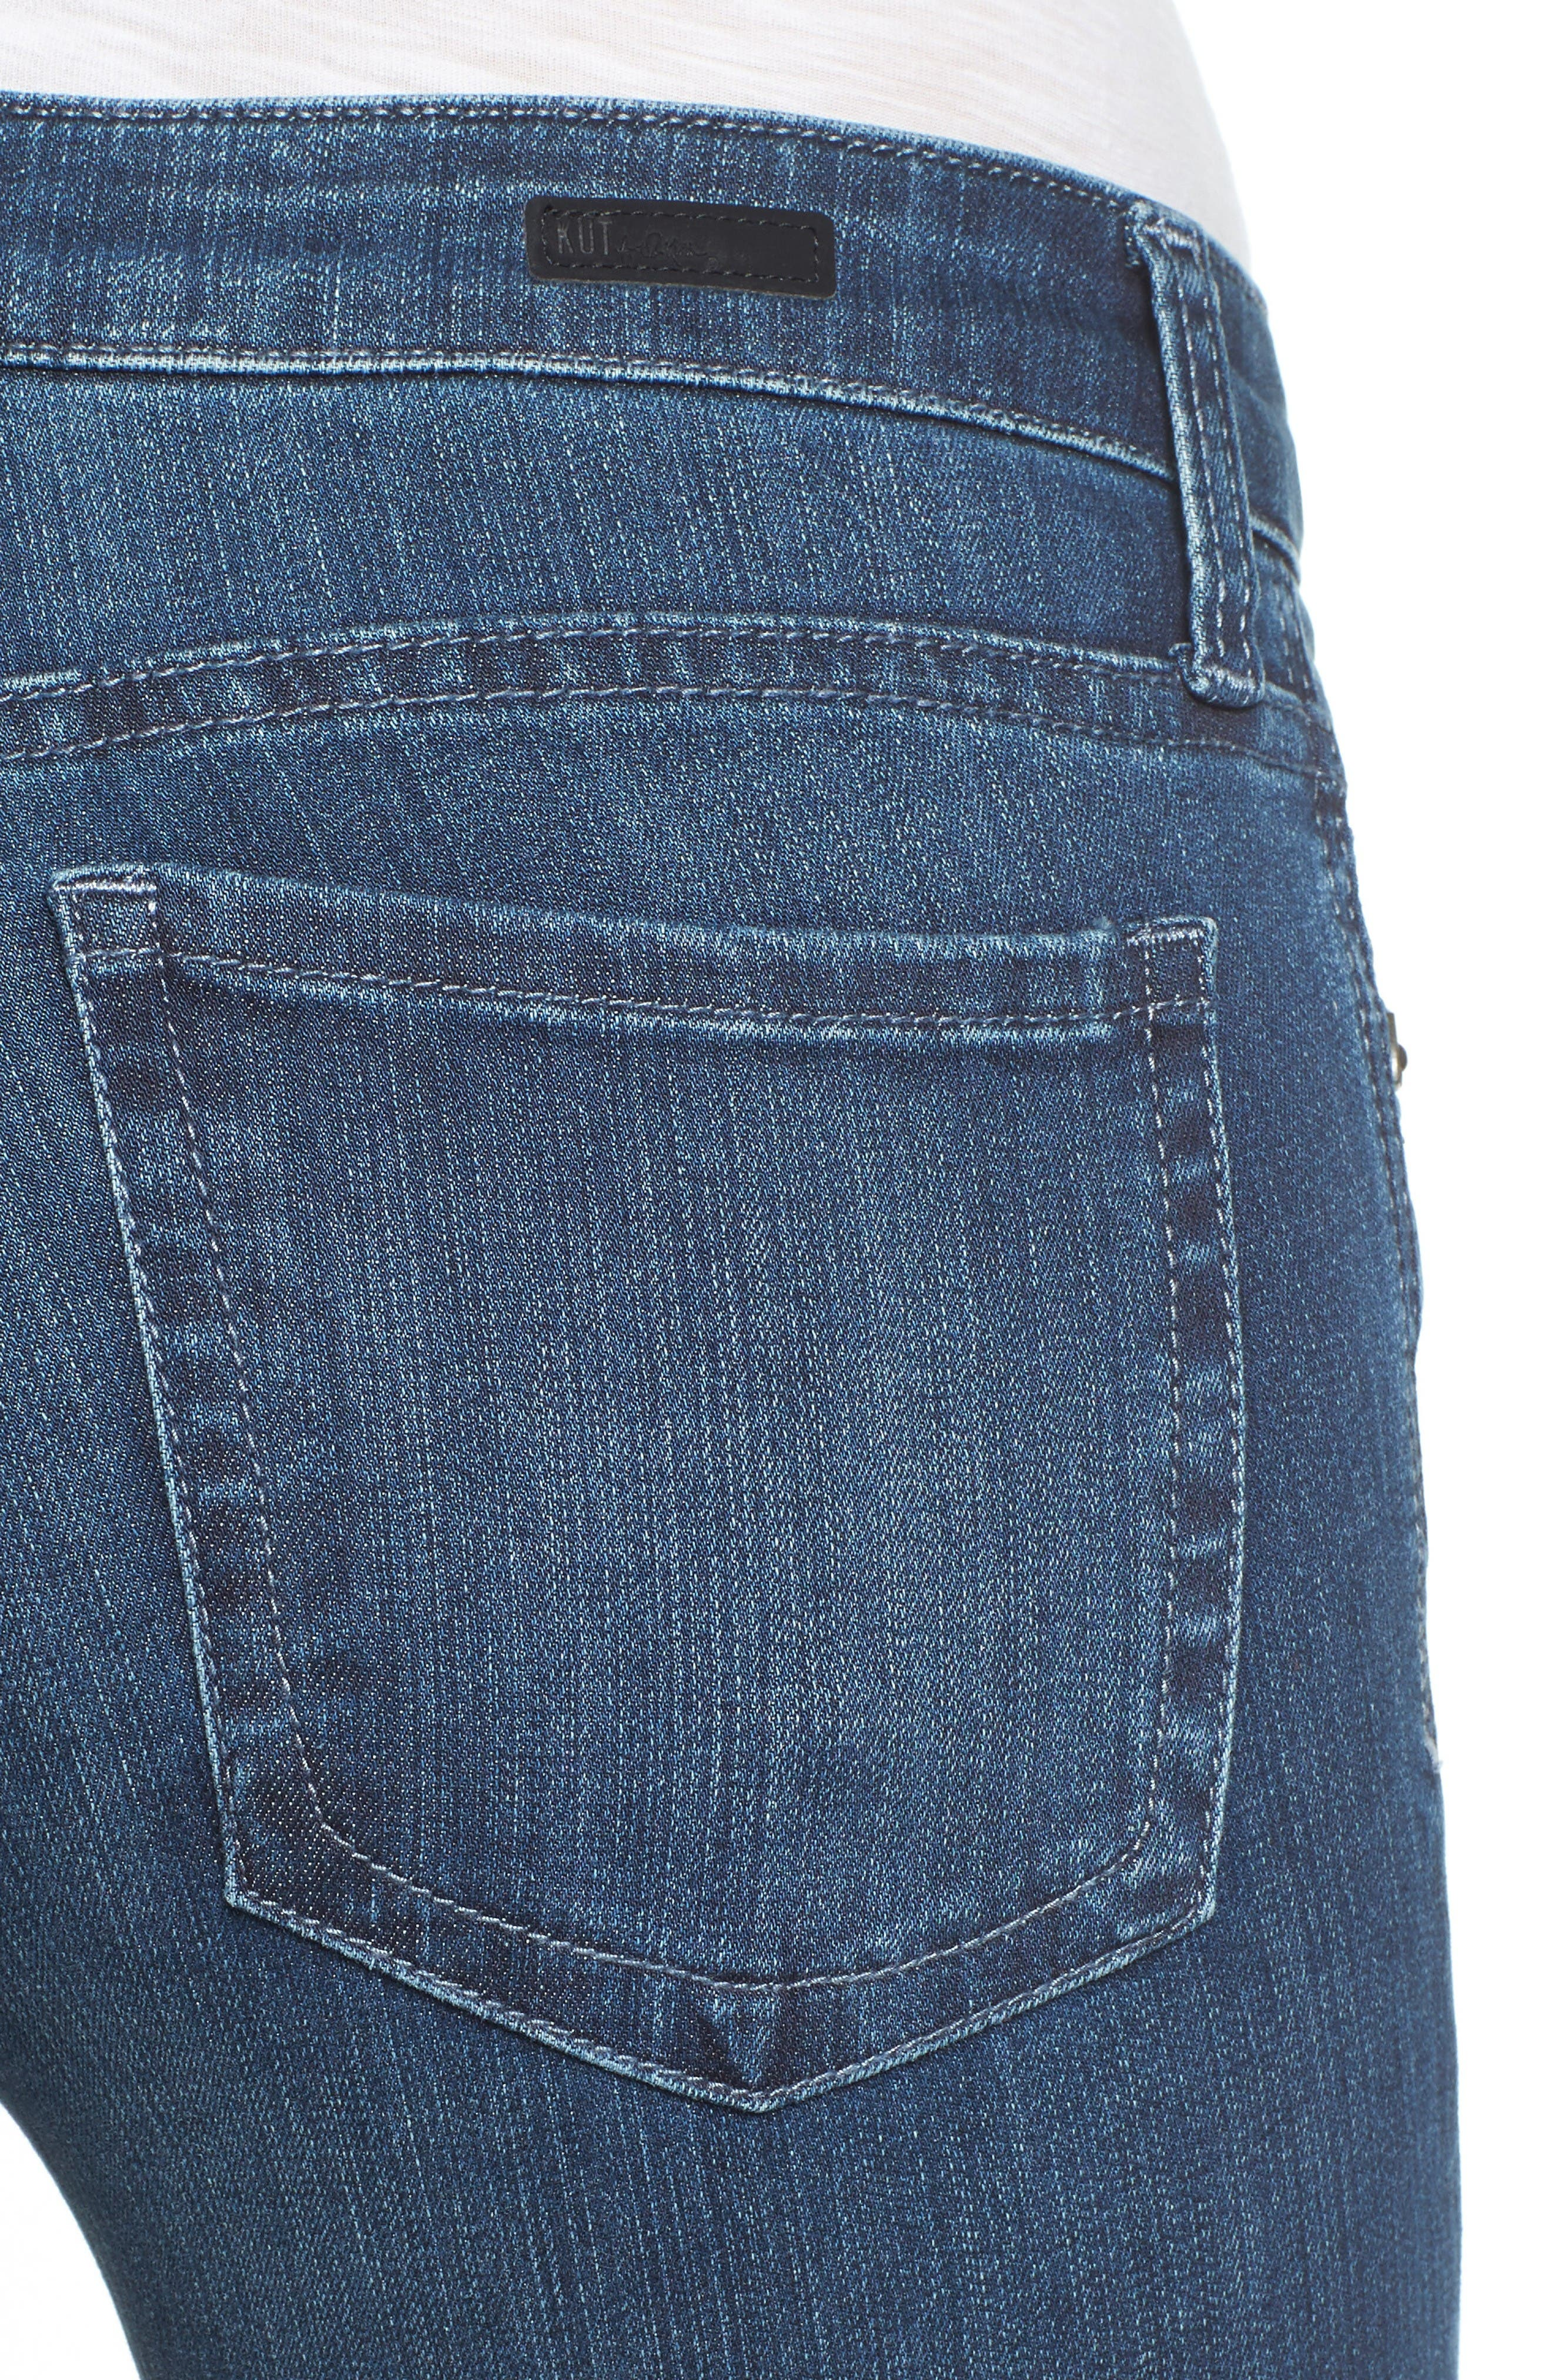 Alternate Image 4  - KUT from the Kloth Diana Stretch Skinny Jeans (Moderation) (Regular & Petite)